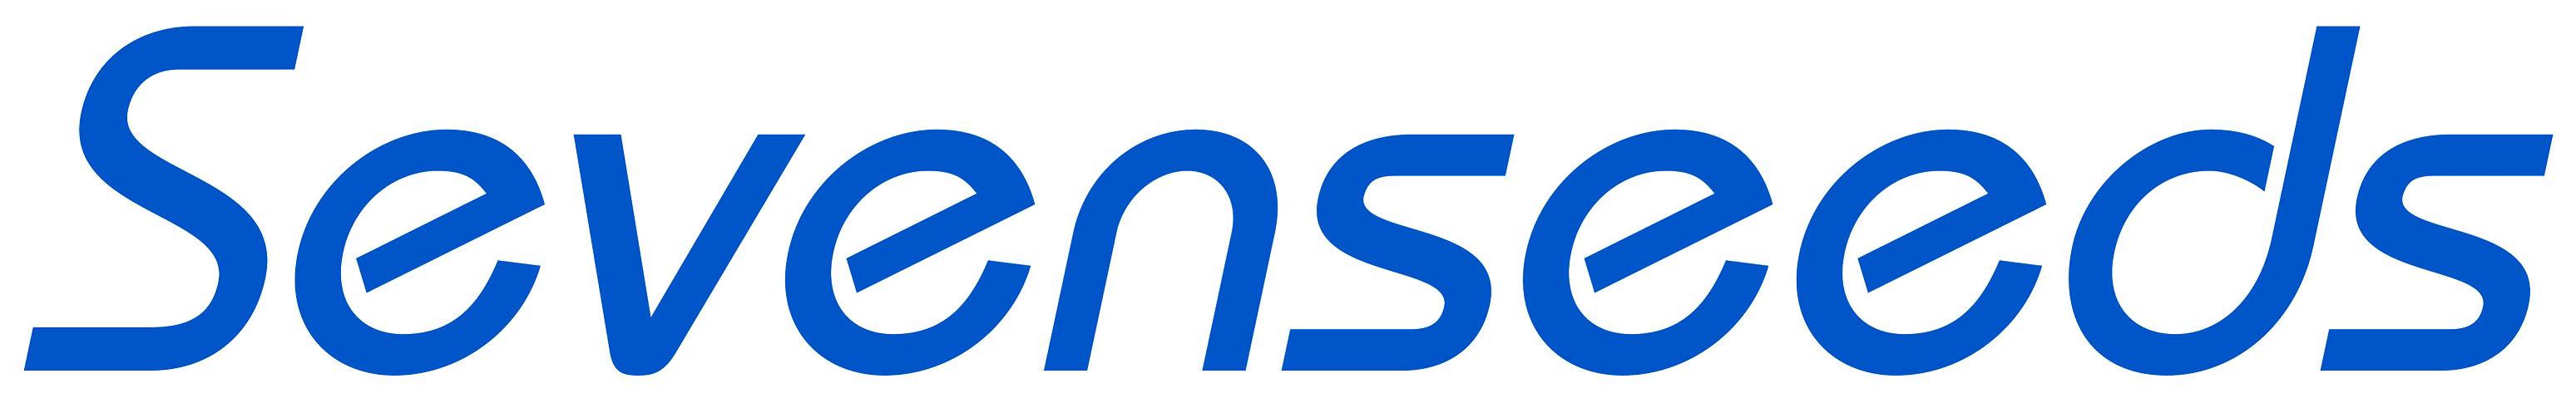 Sevenseeds(セブンシーズ):恒温槽・環境試験装置の販売と受託試験